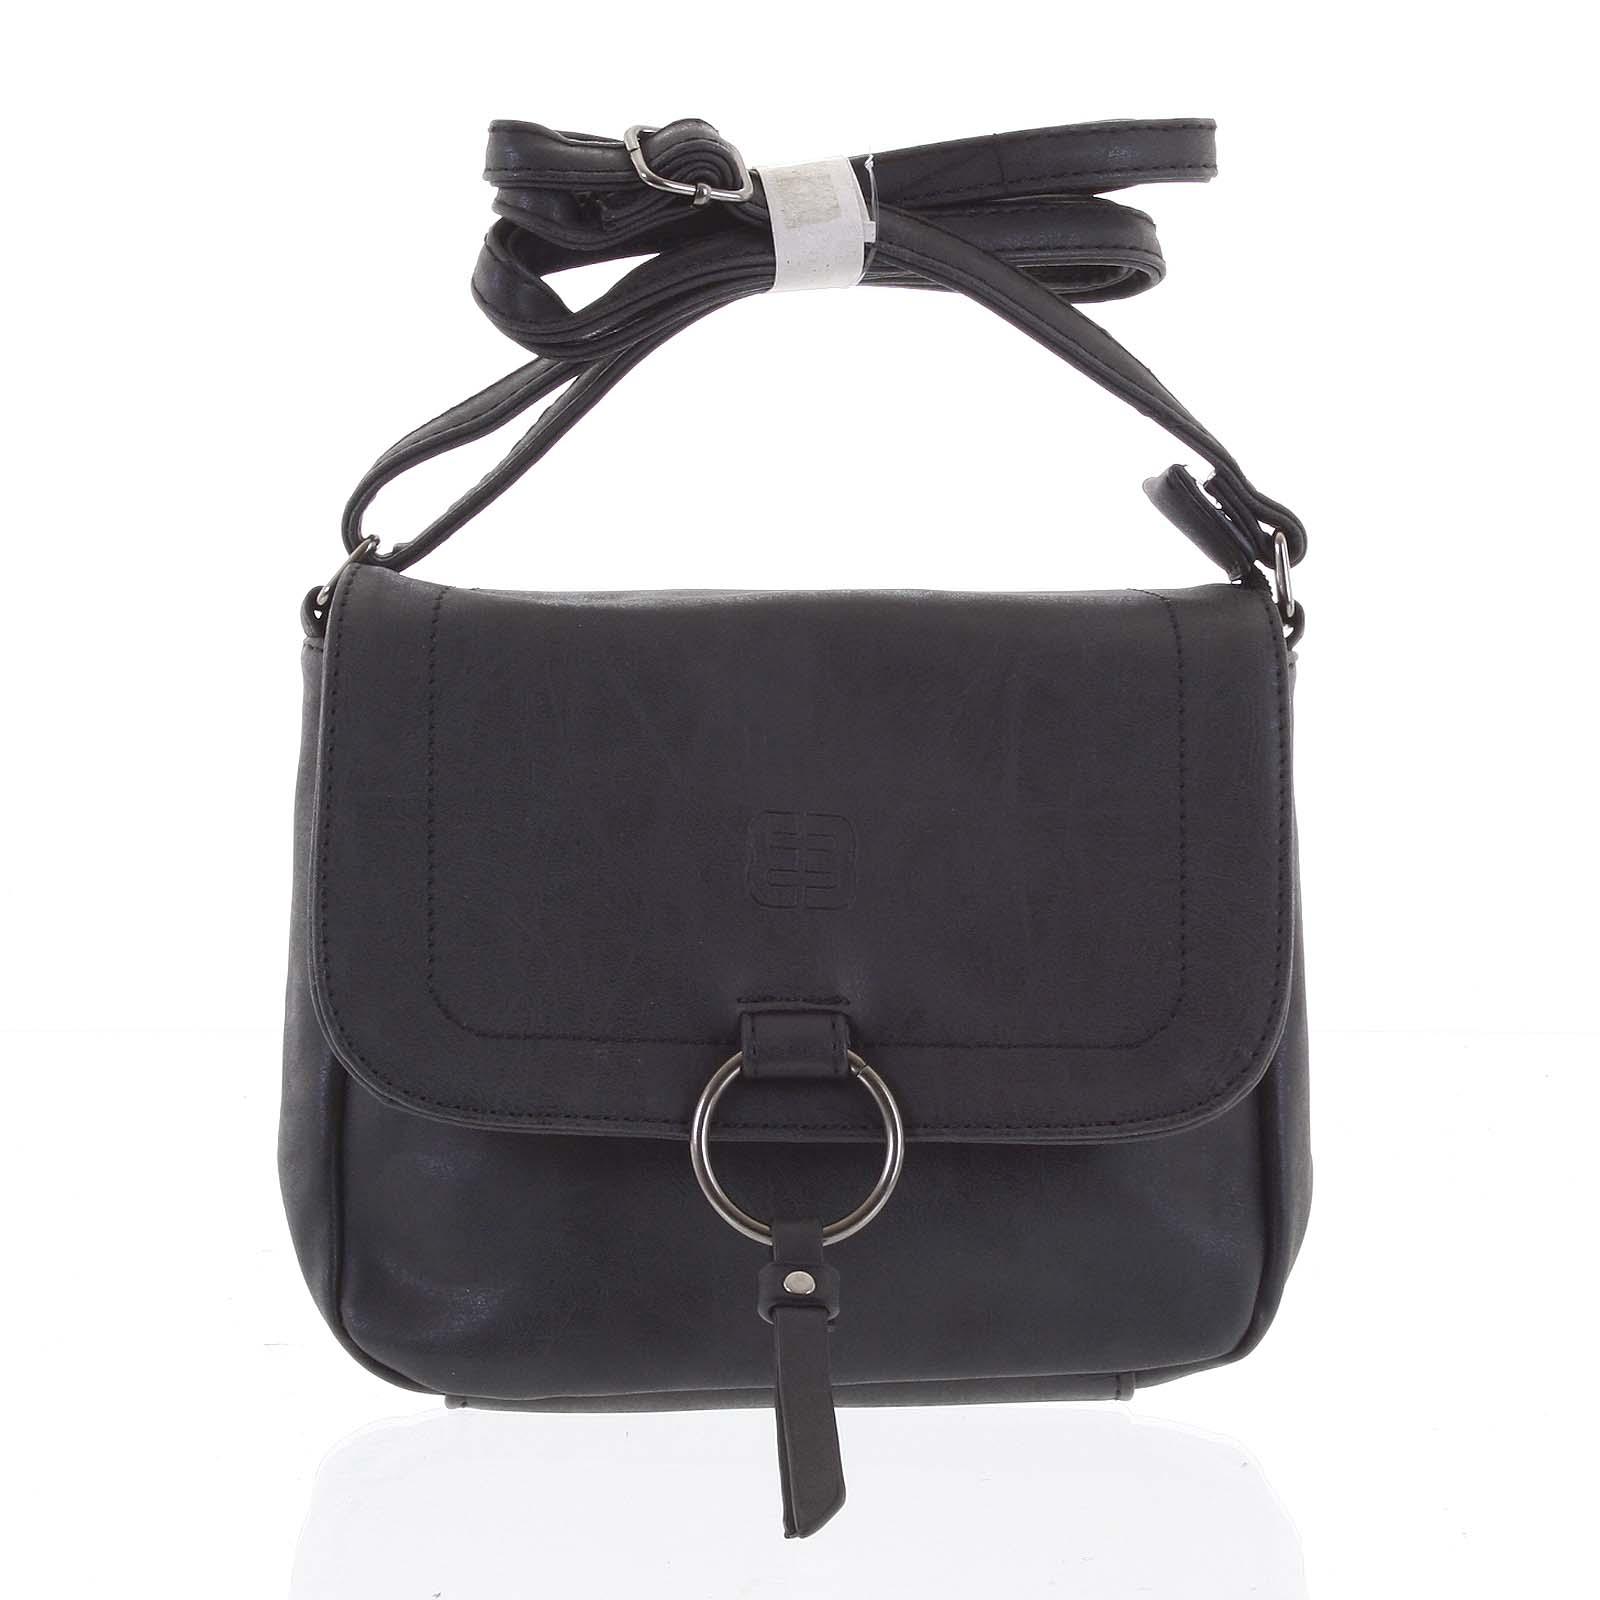 Crossbody kabelka malá černá - Enrico Benetti Echo